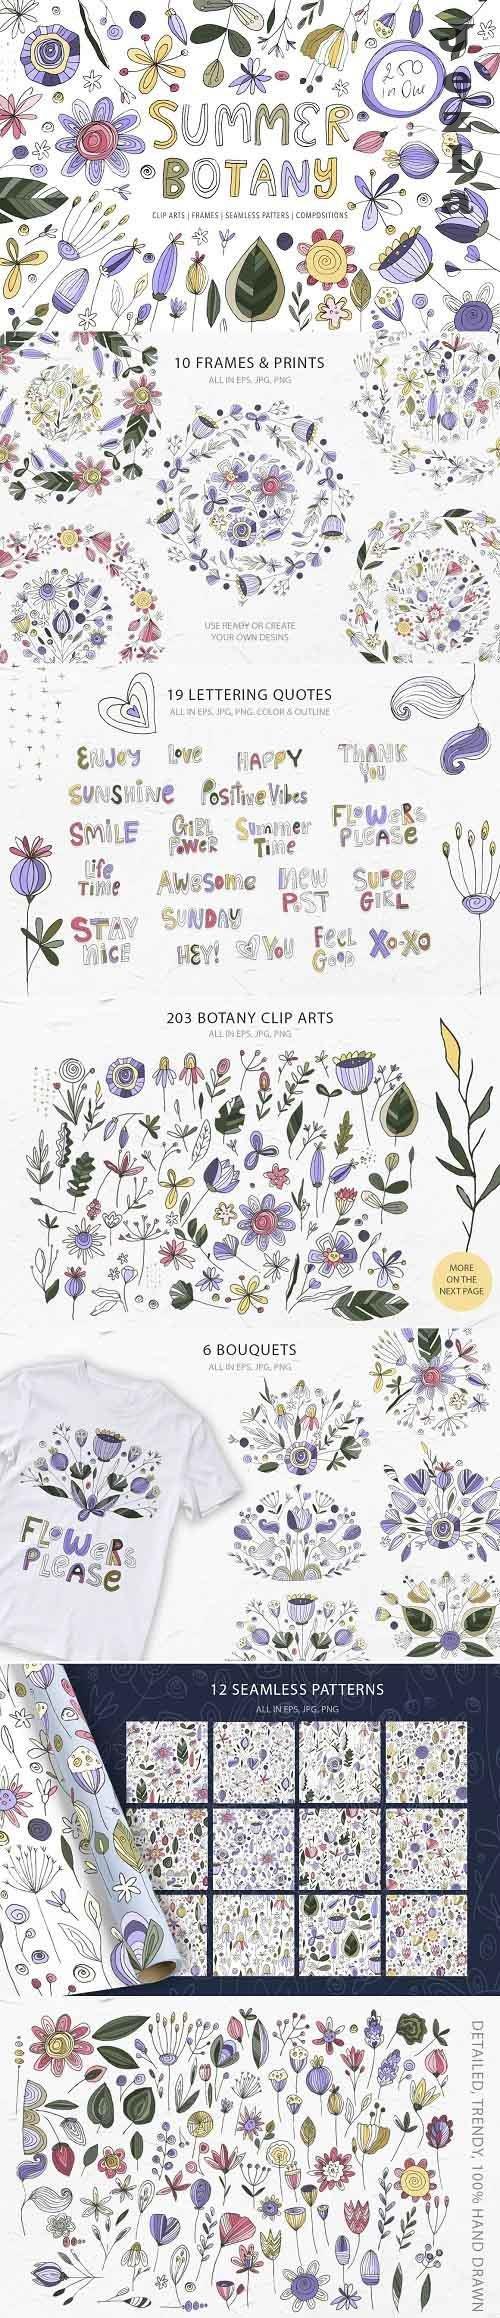 Summer Botany. Floral Graphic Pack - 5149907